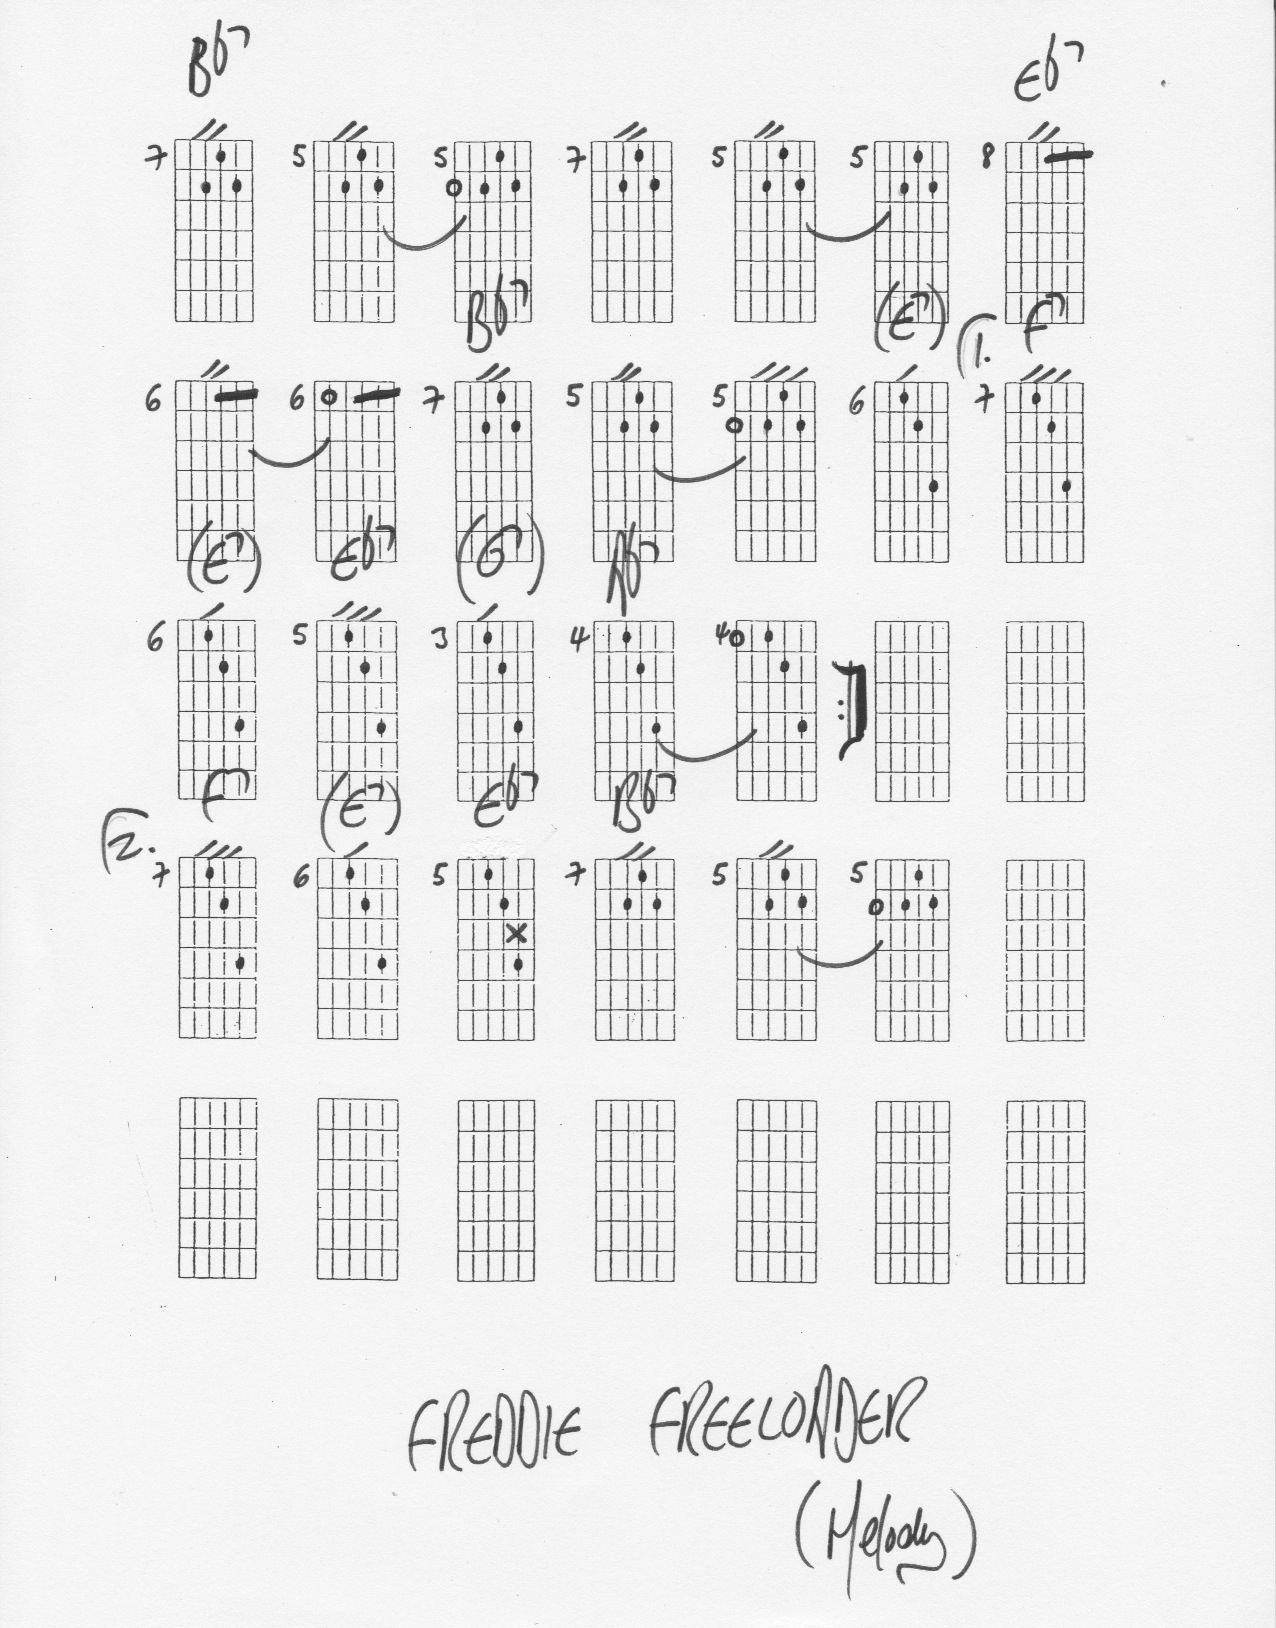 Freddie Freeloader By Miles Davis Harmony Harmonized Melody Chord